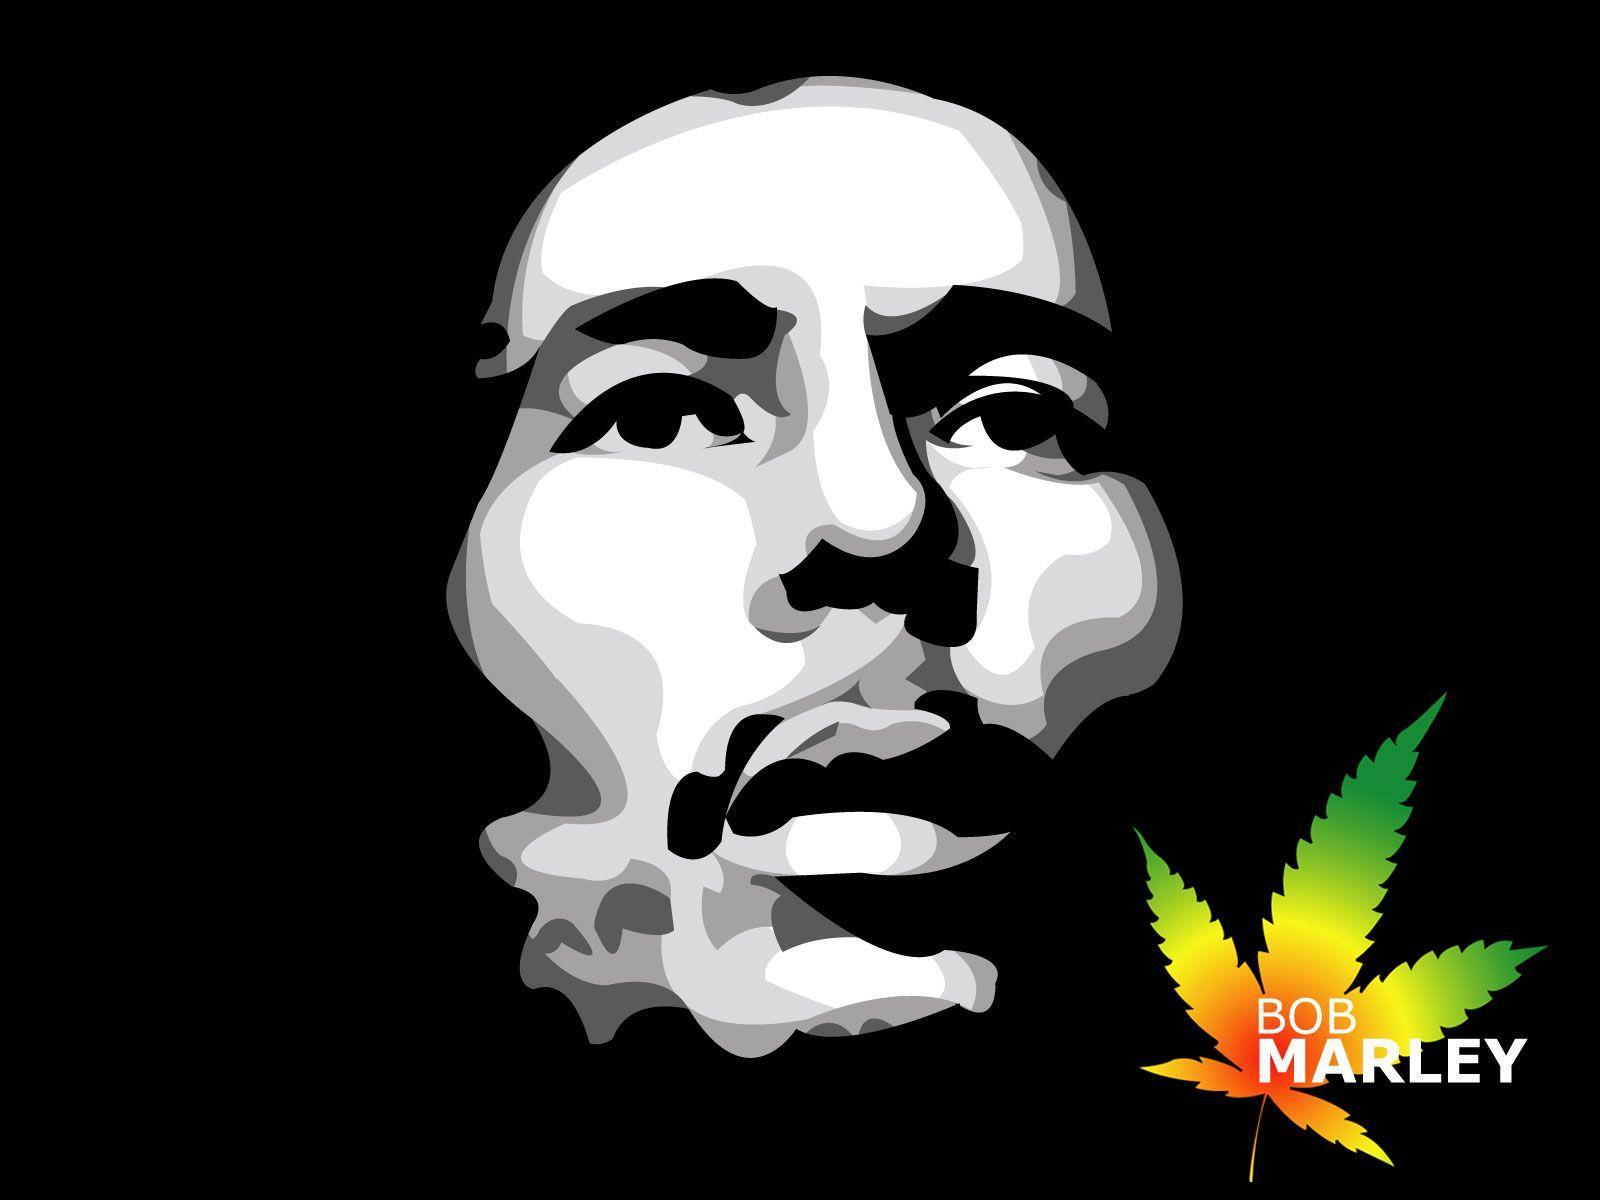 361f839f32 Bob Marley Colors Wallpaper Hd | AnythingNokias.Com - Nokia News .